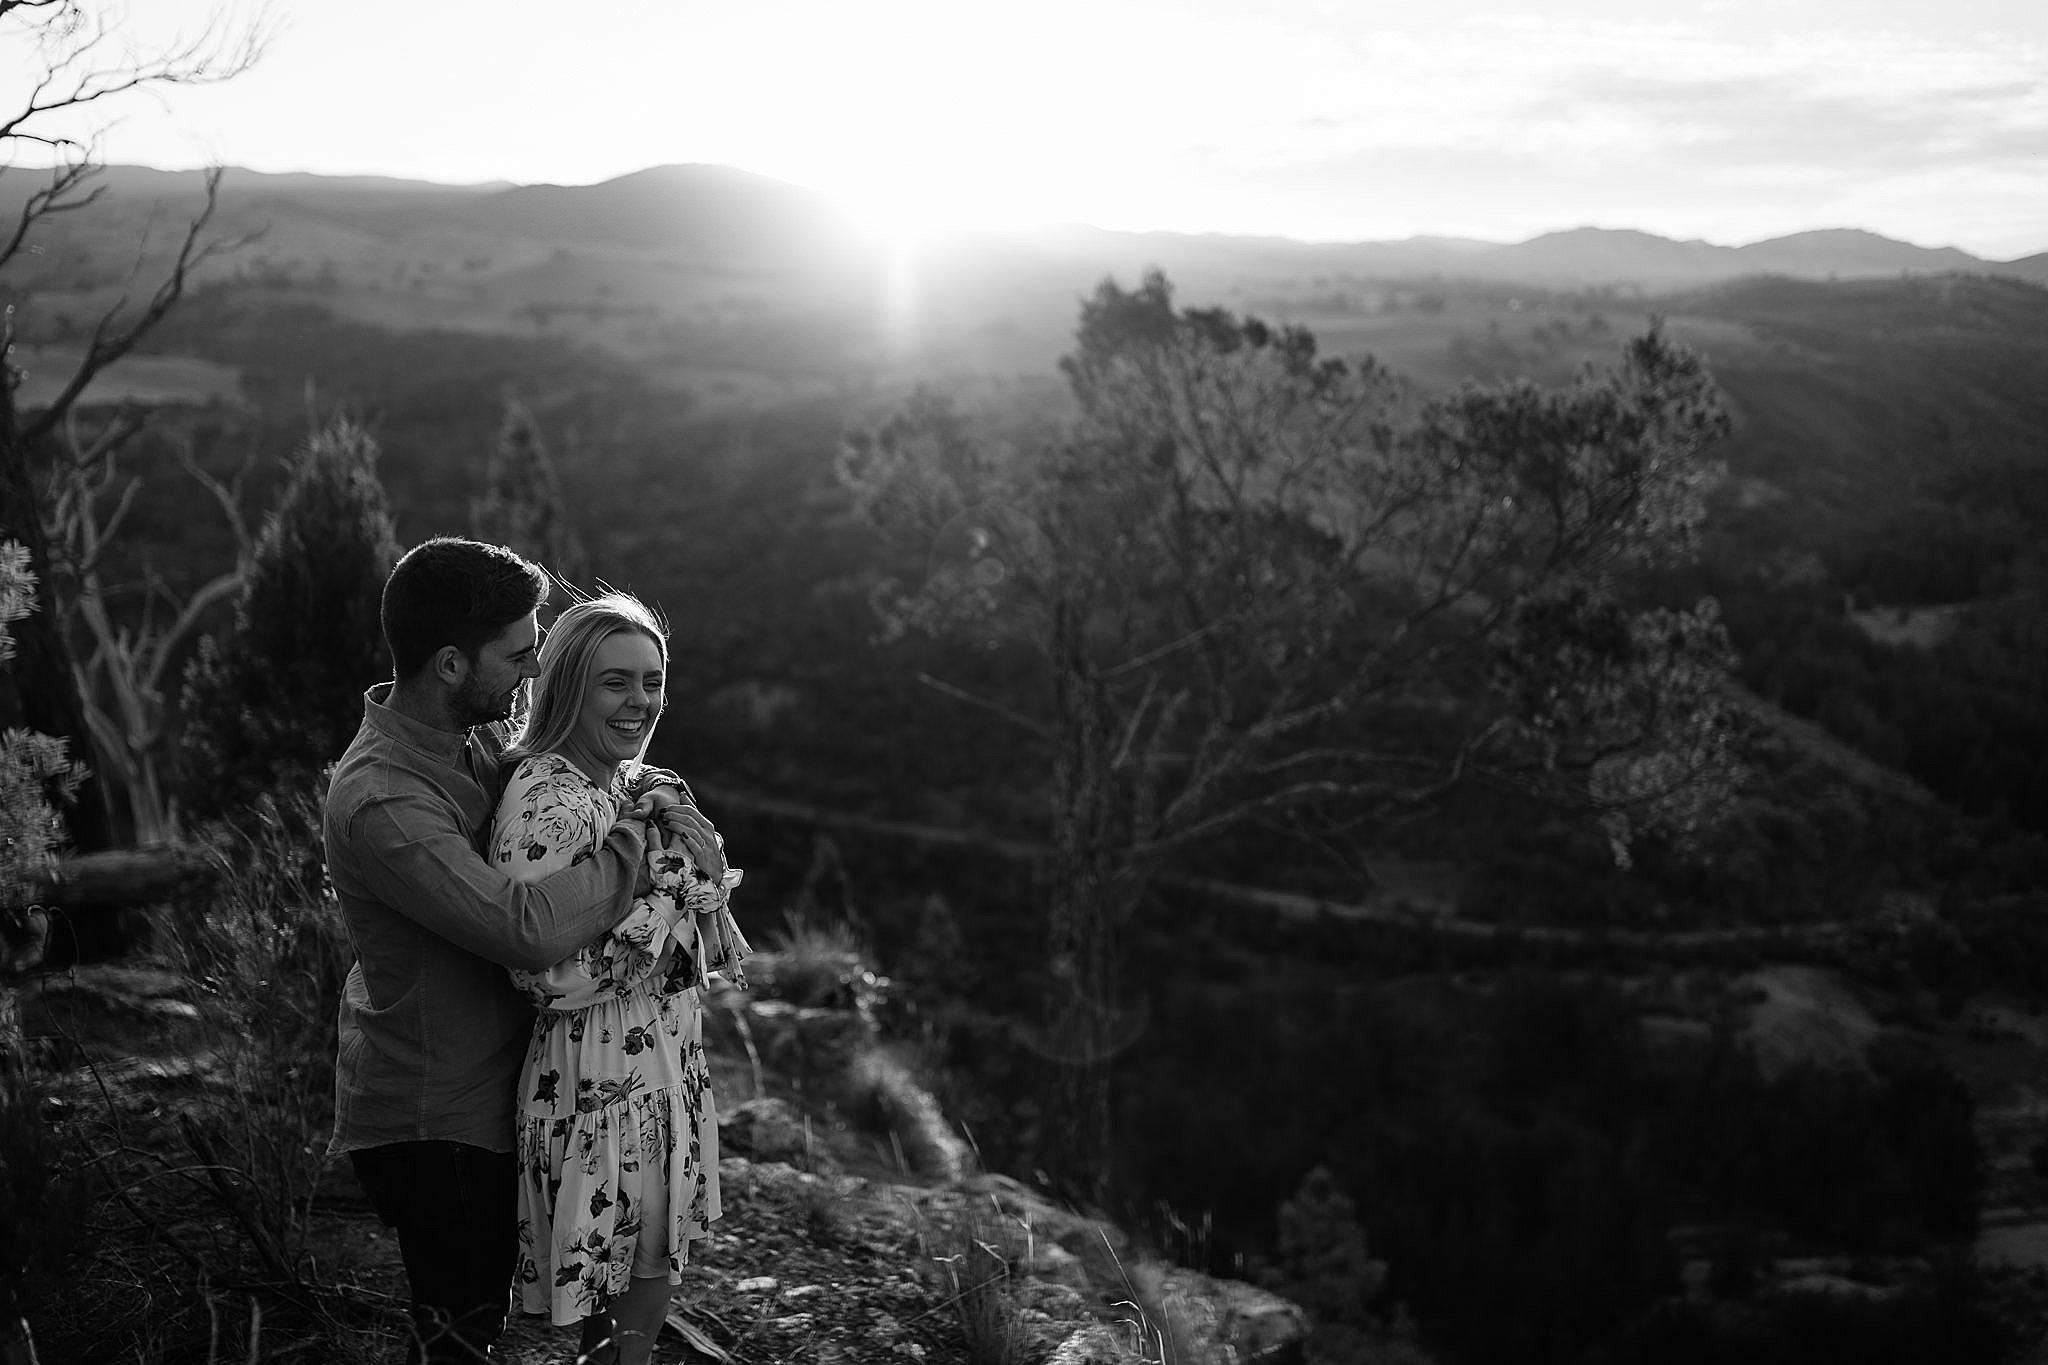 Canberra Portrait Photography,Keepsakephoto by the Keeffes,Canberra Wedding Photographer,canberra wedding,Engagement,Engagement Photography,canberra weddings,Pialligo Estate wedding,Pialligo Redwood forest,ACT weddings,ACT wedding photographer,Destination photographer,country wedding,